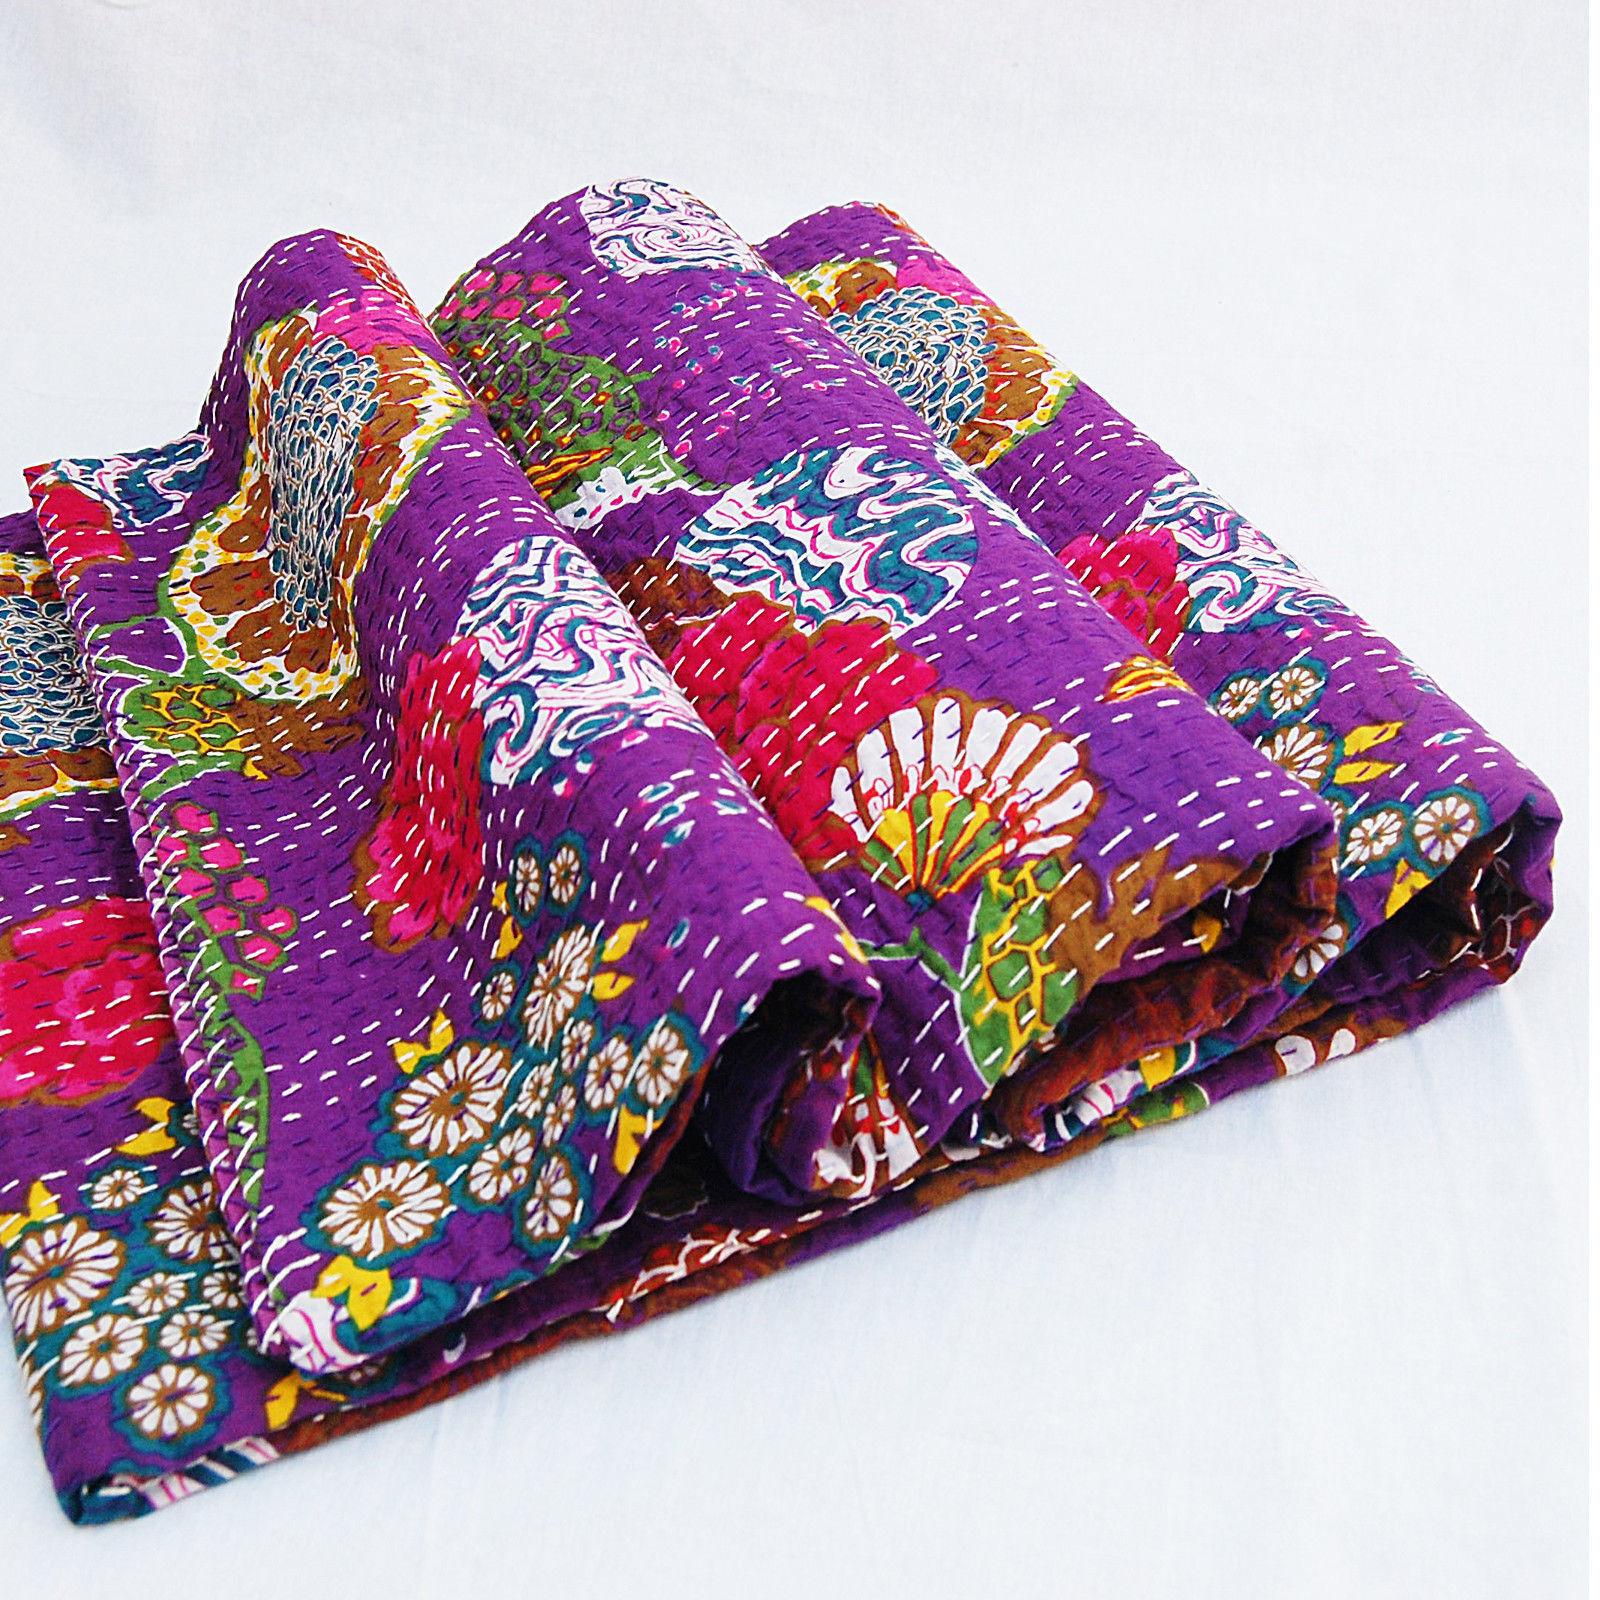 Indian Kantha Quilt Cotton Blanket Handmade Bedding Bedspread Single Quilt